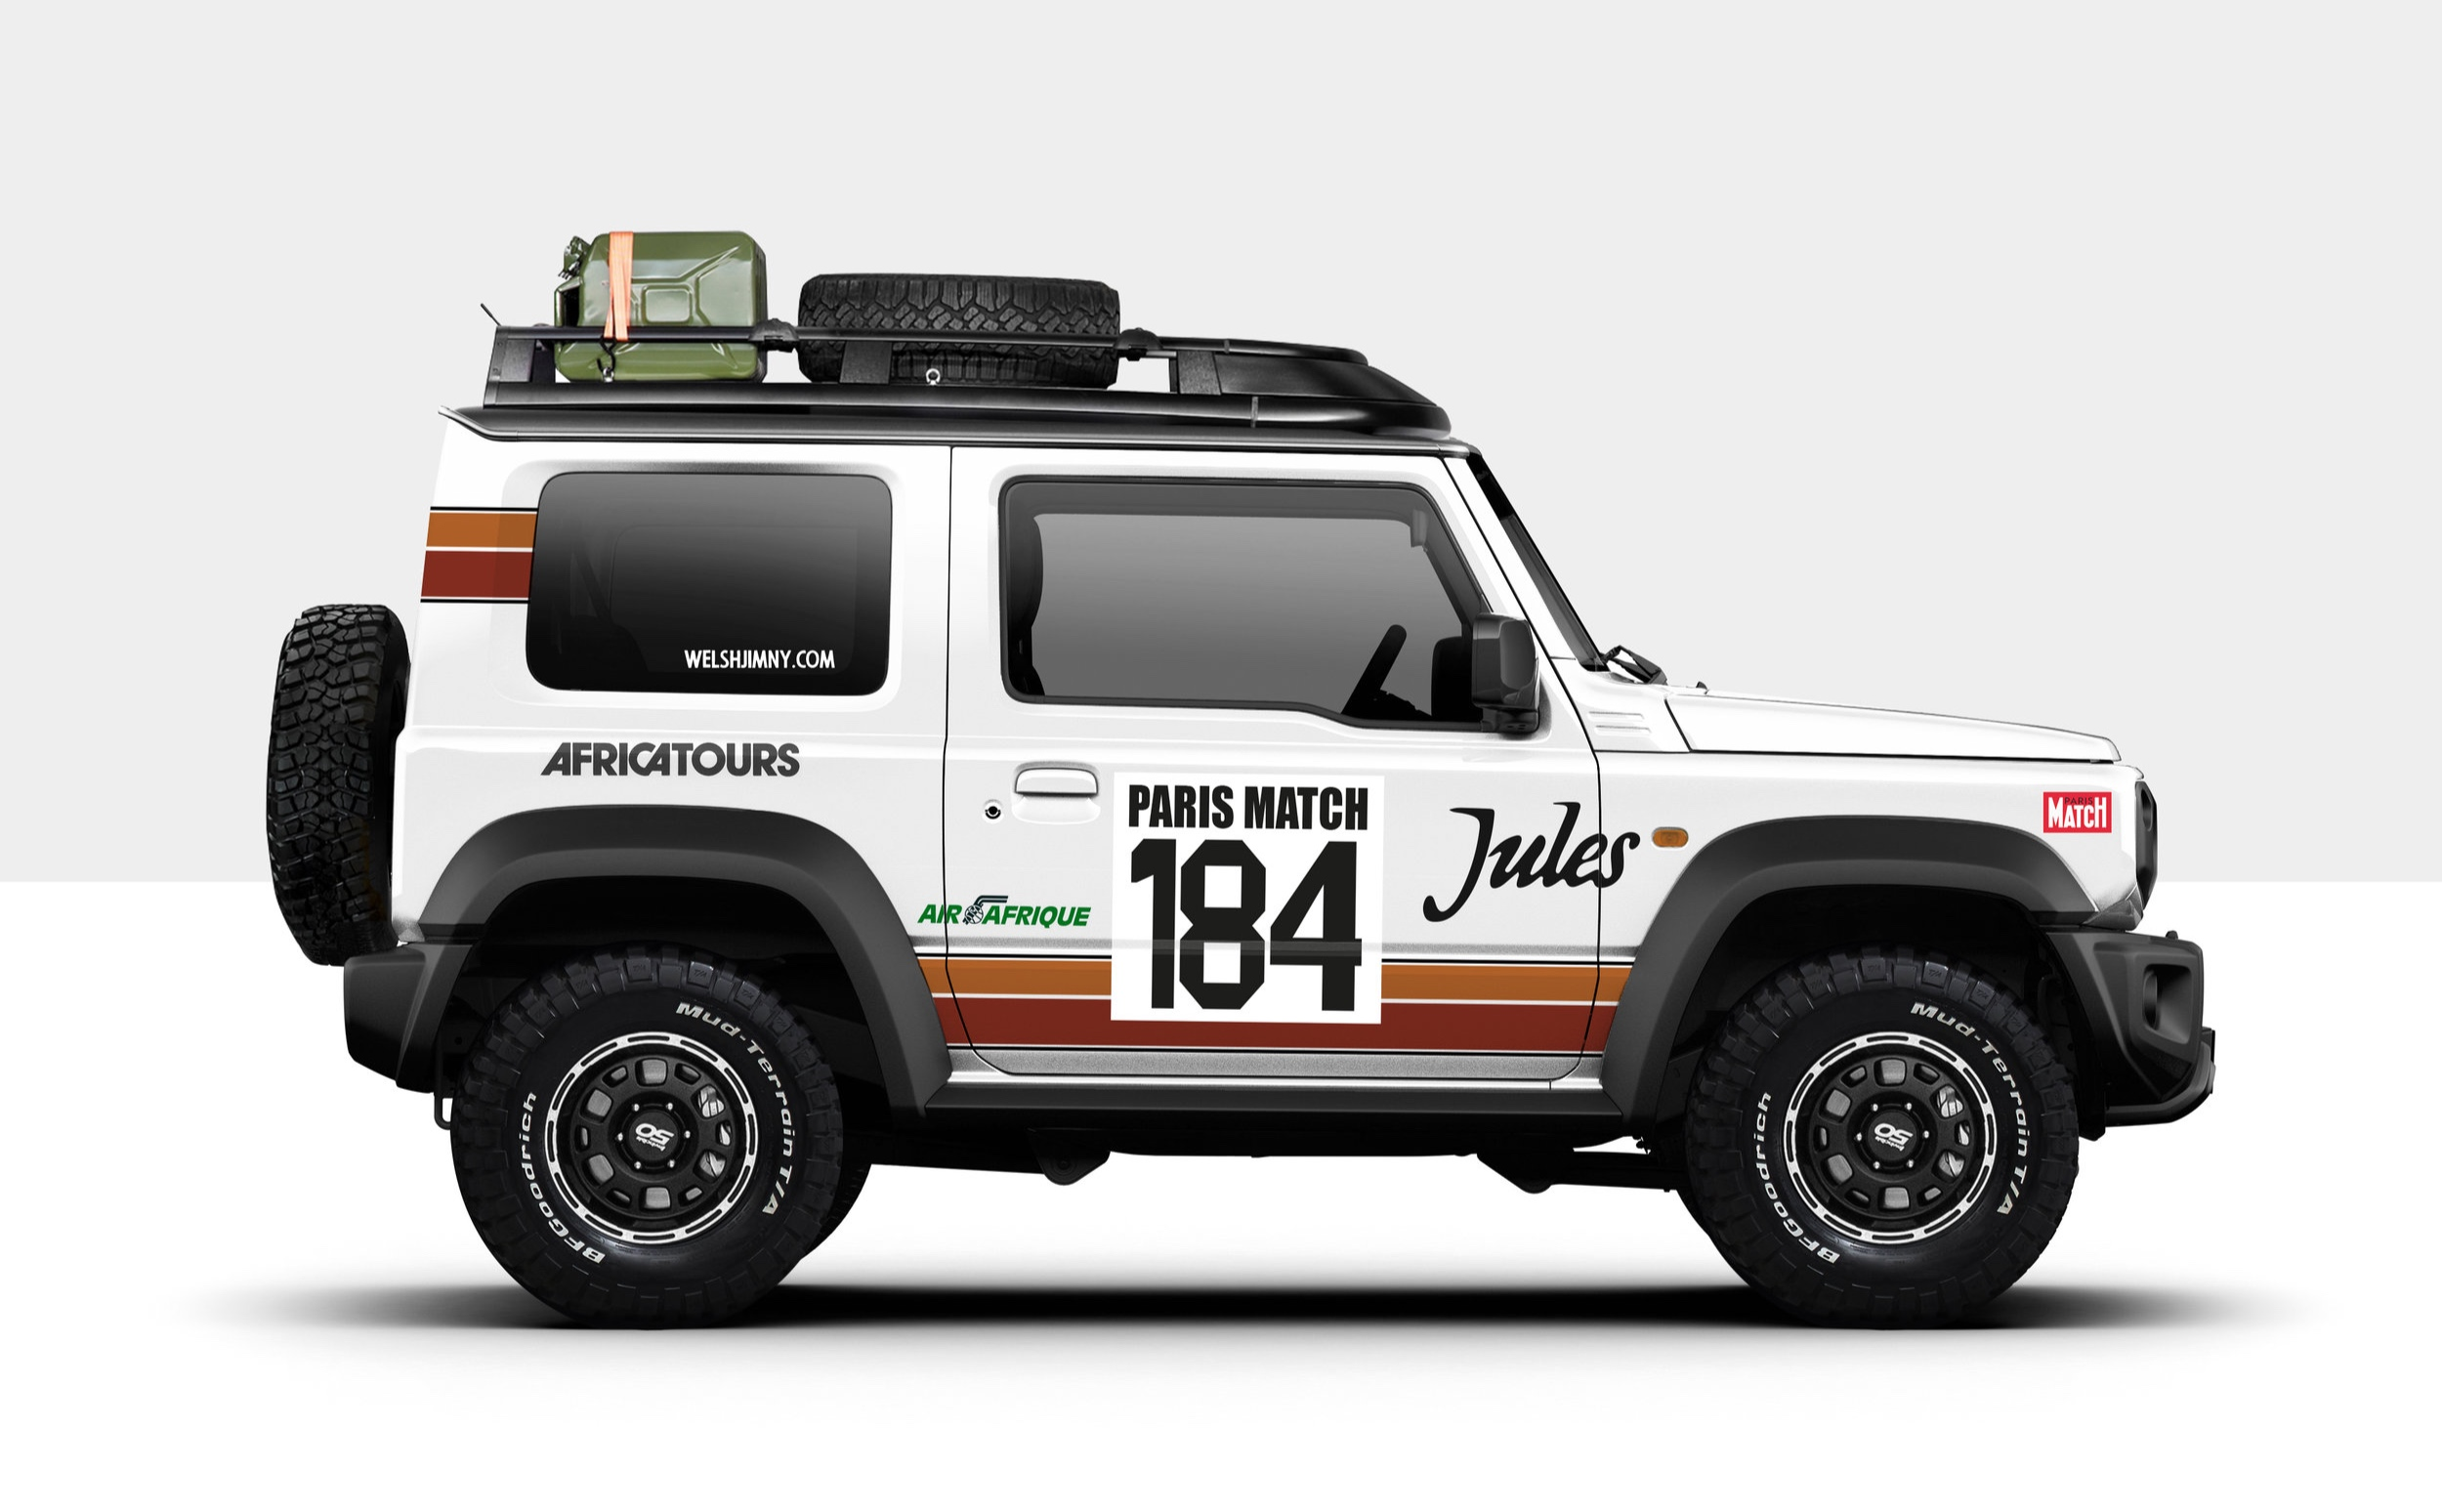 1981 Paris-Dakar Rolls-Royce Corniche Livery